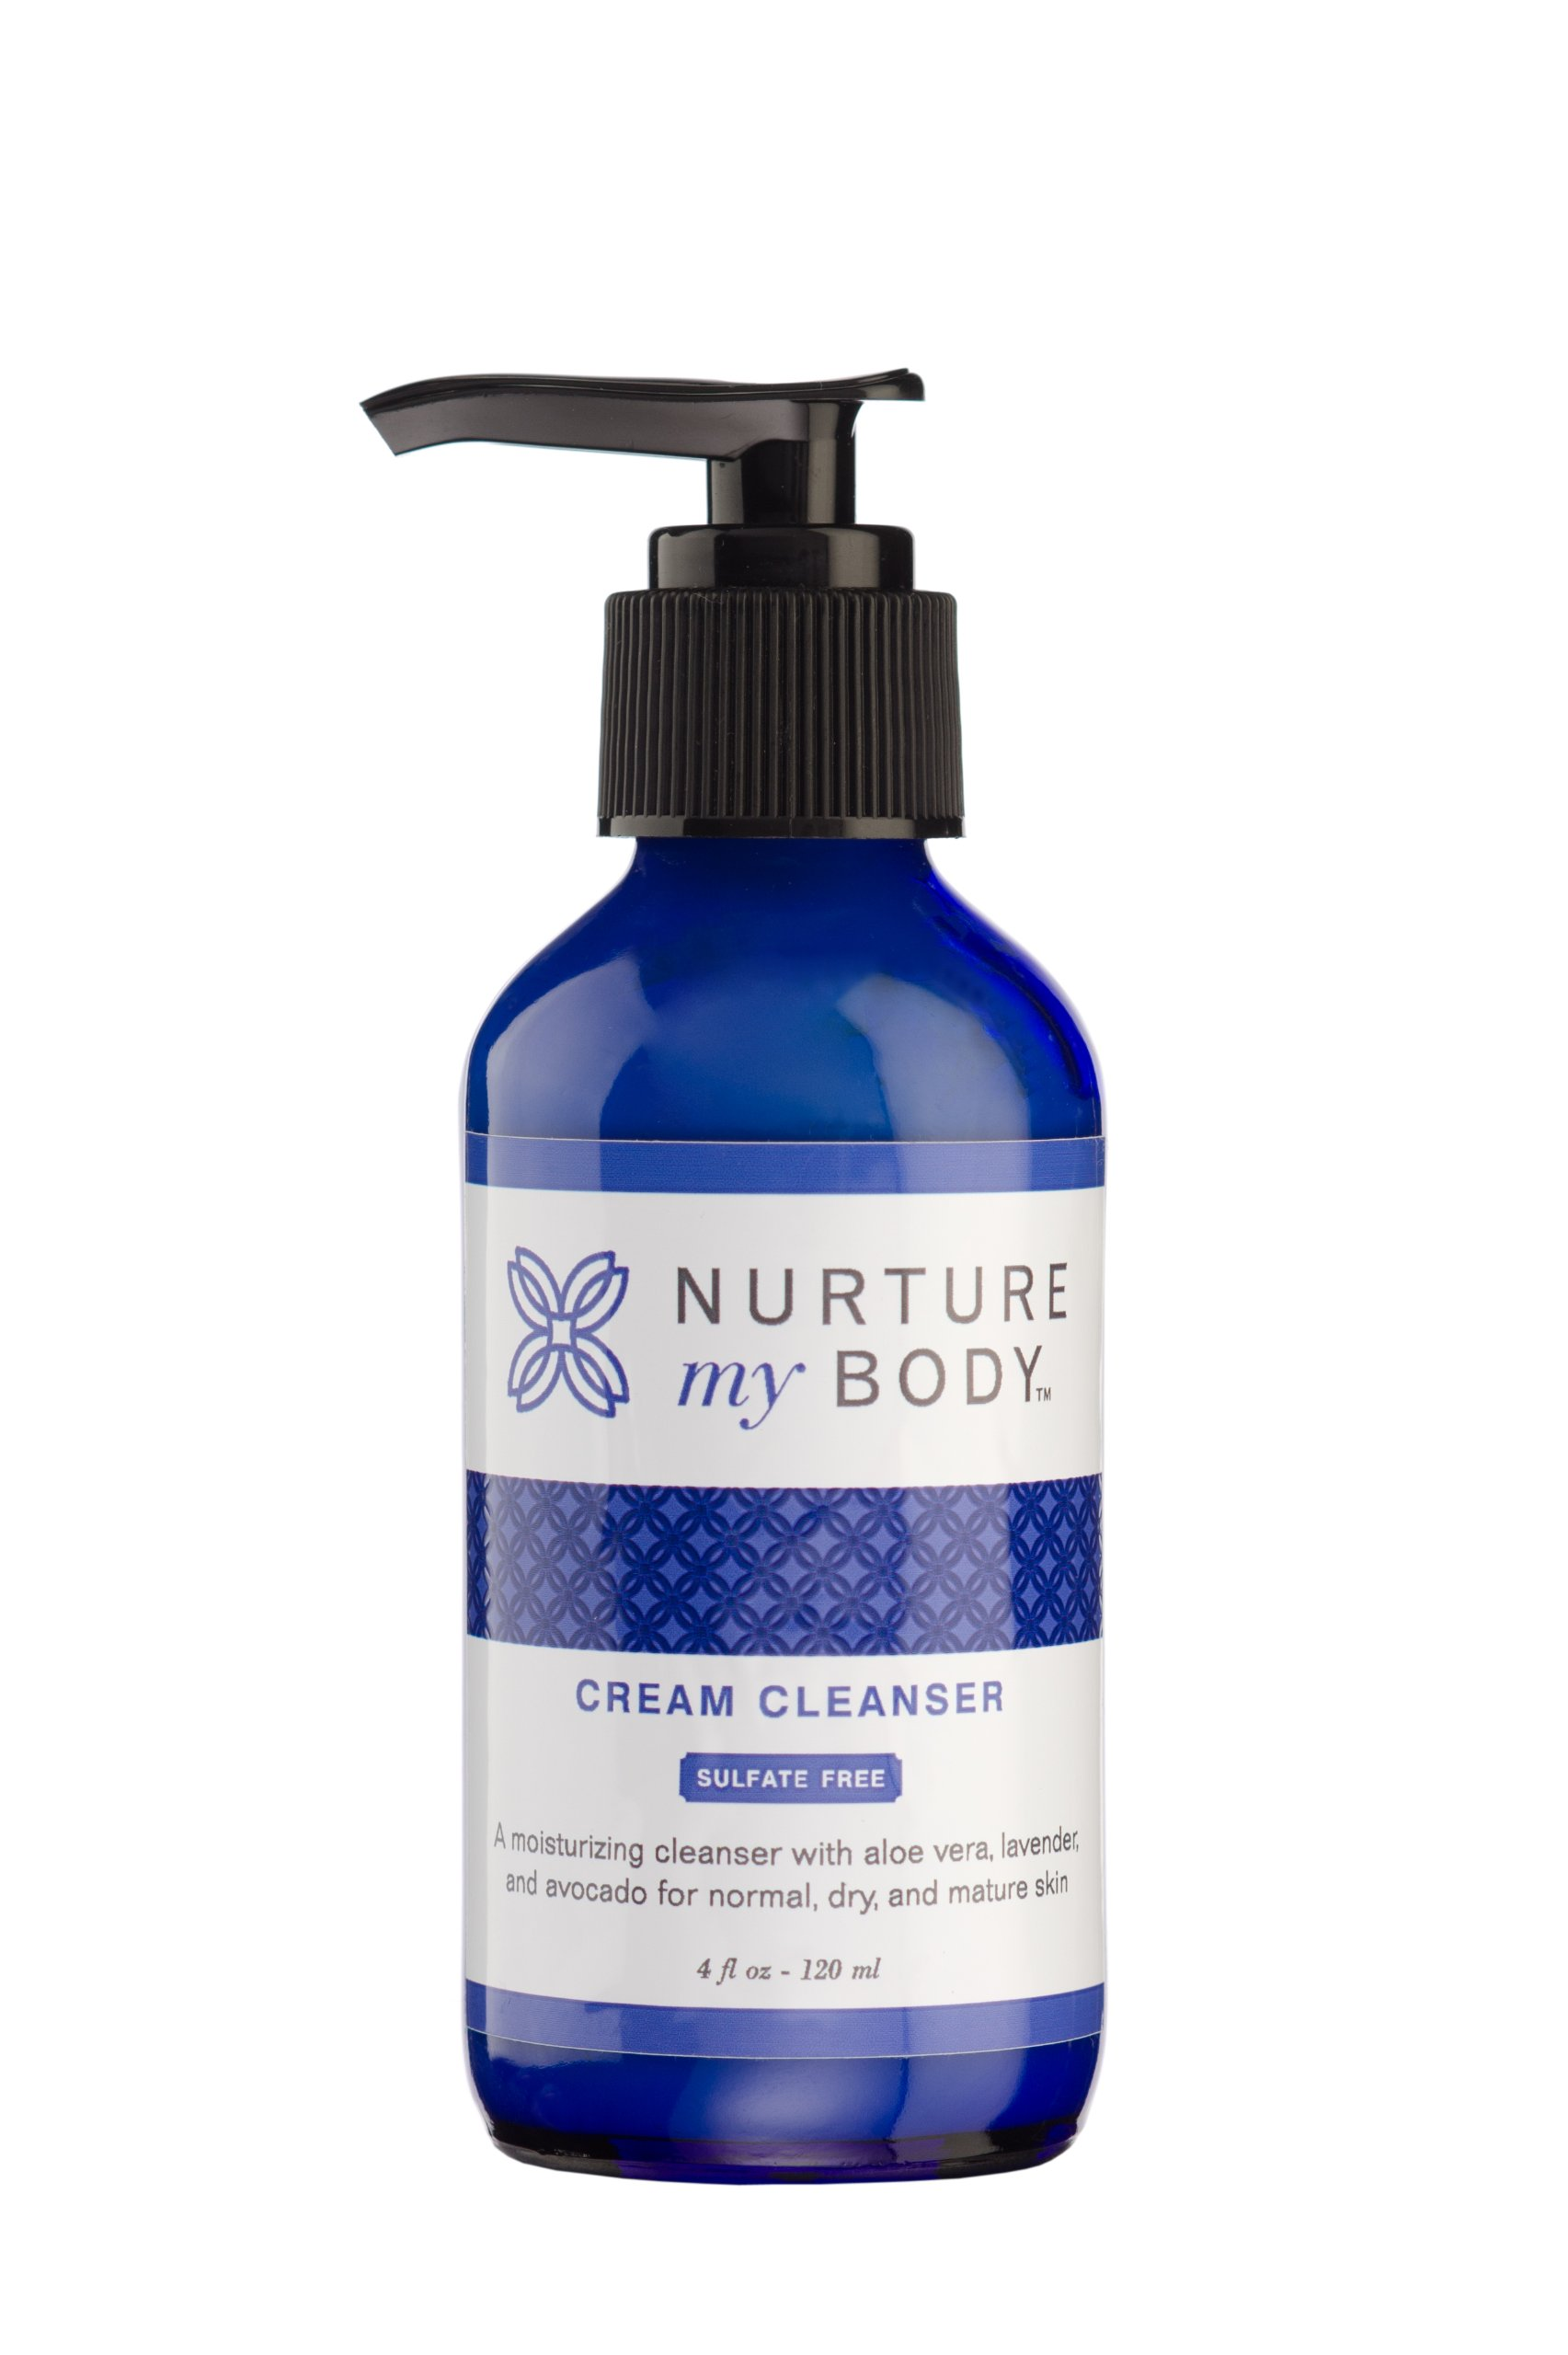 Nurture My Body All-Natural Facial Cream Cleanser & Wash, 4 fl oz. - Certified Organic Ingredients